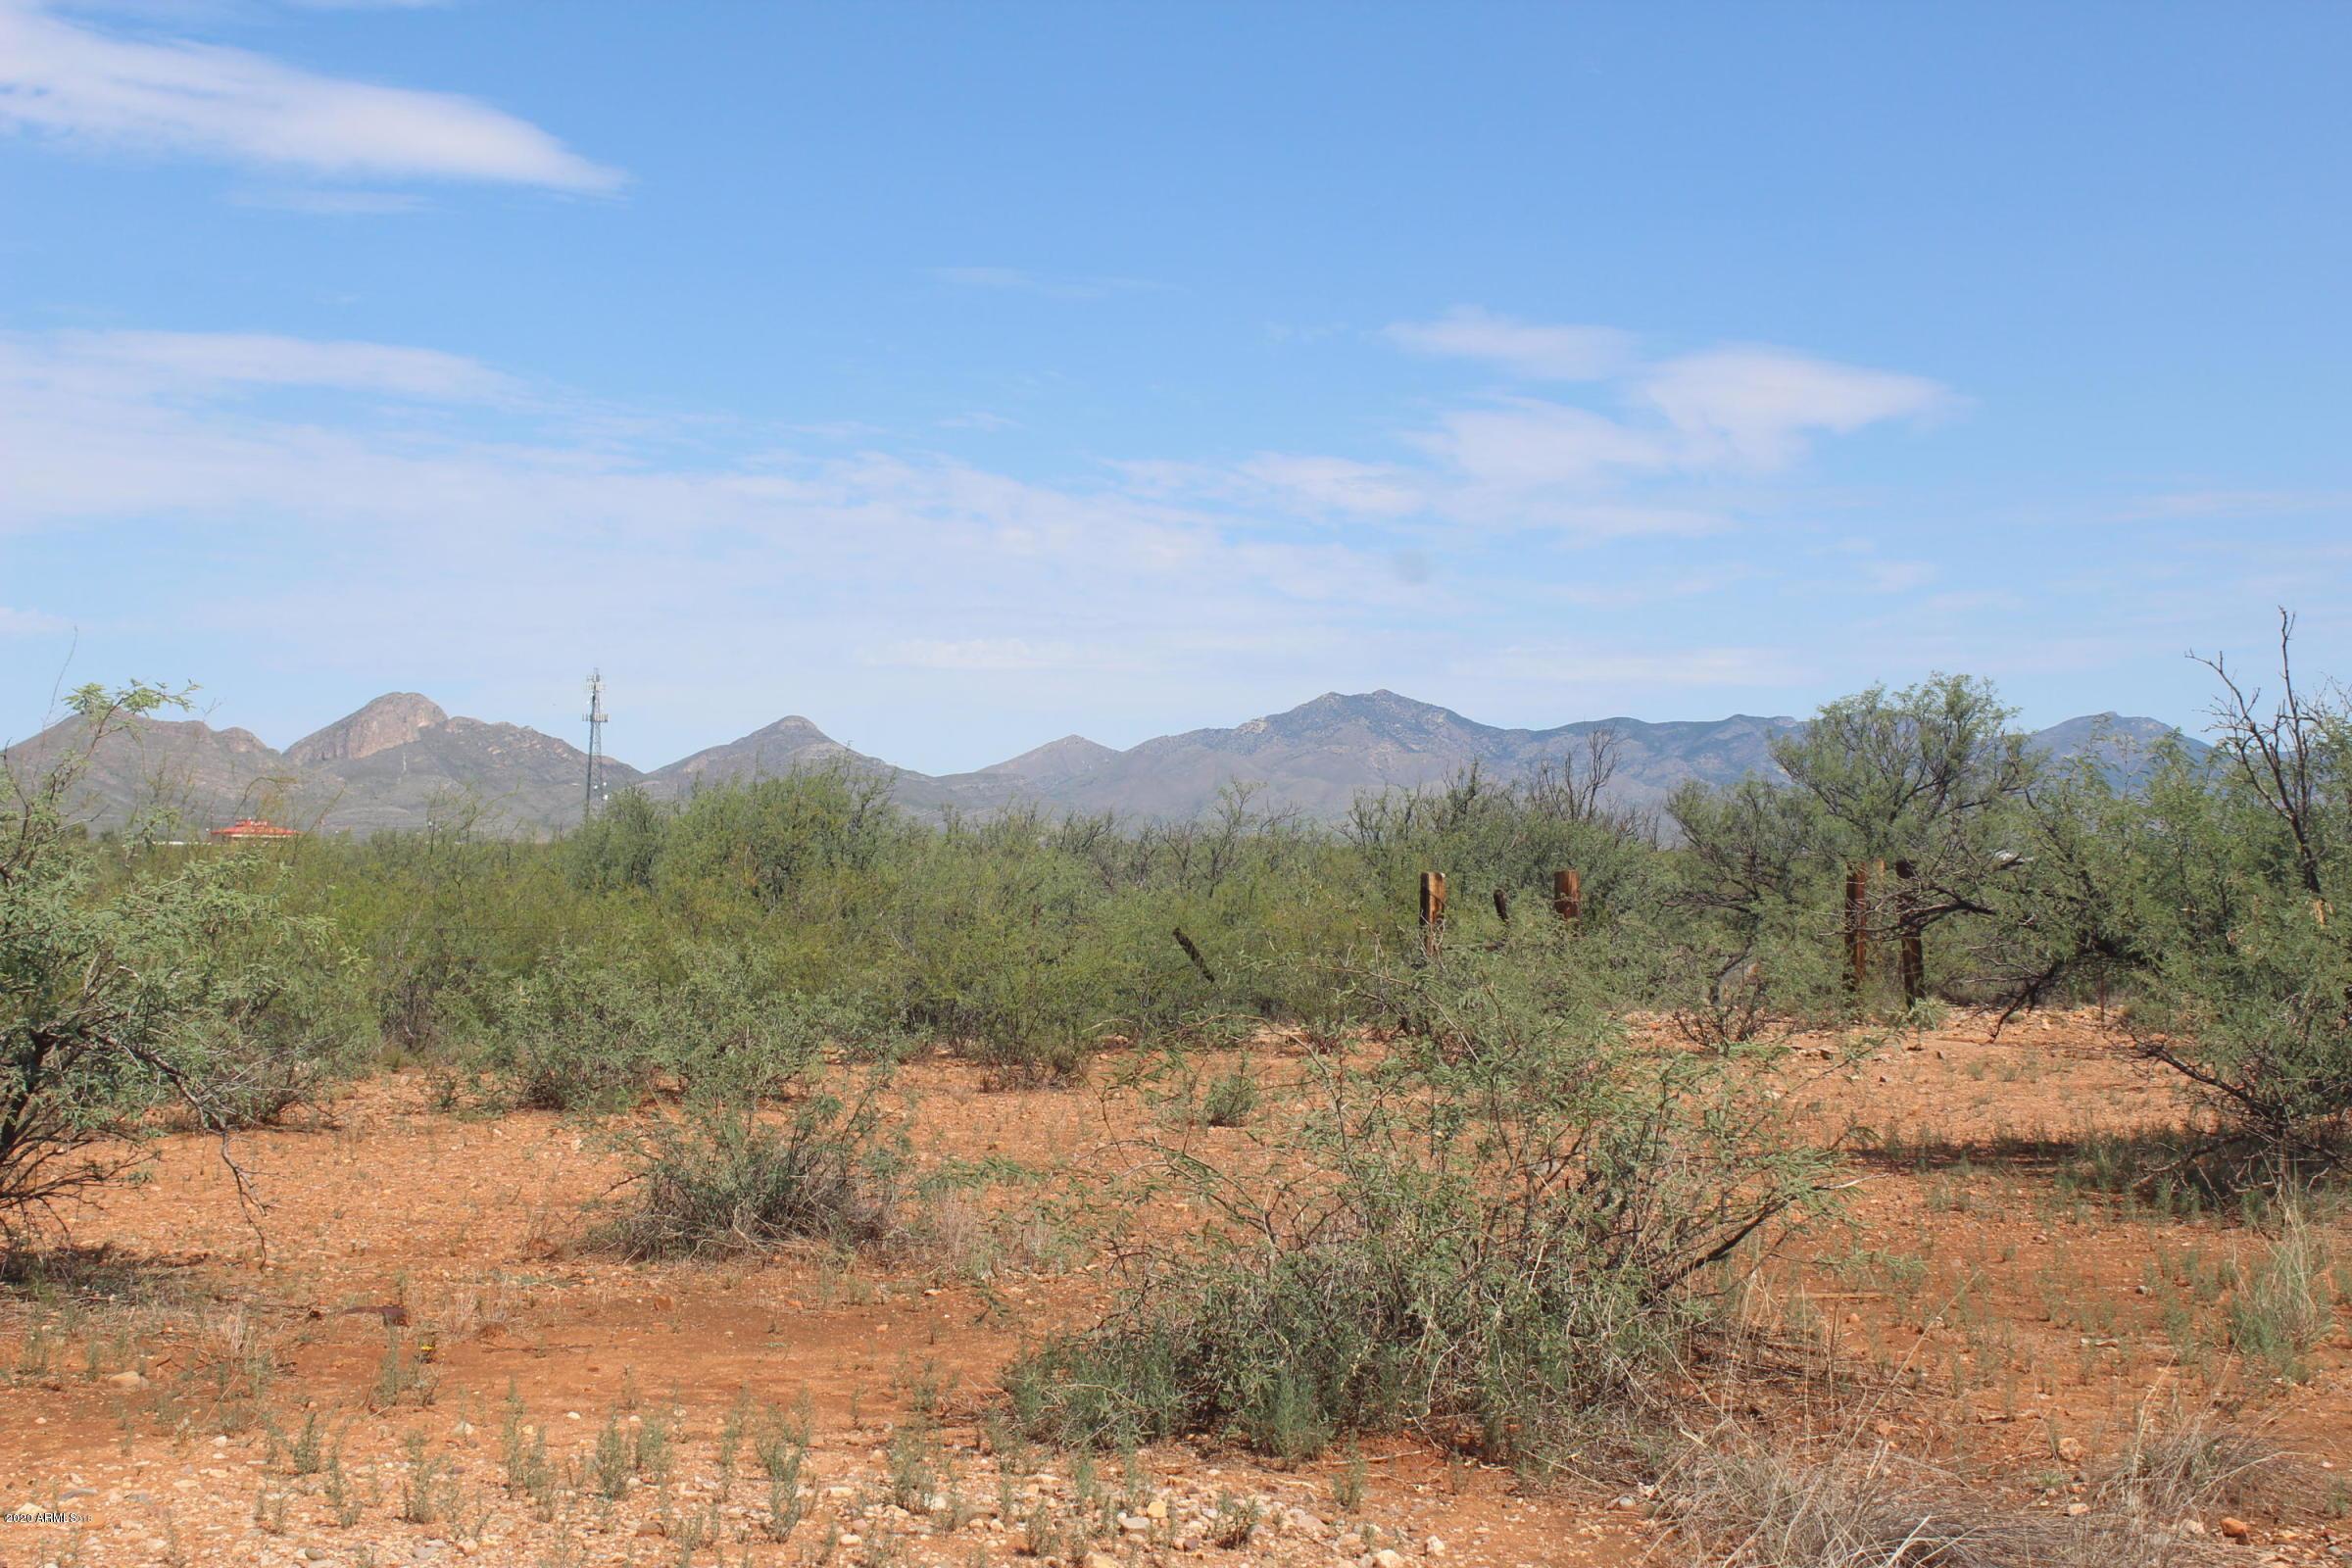 TBD Taylor 106-15-039 M Way, Huachuca City, Arizona 85616, ,Land,For Sale,TBD Taylor 106-15-039 M Way,6134087